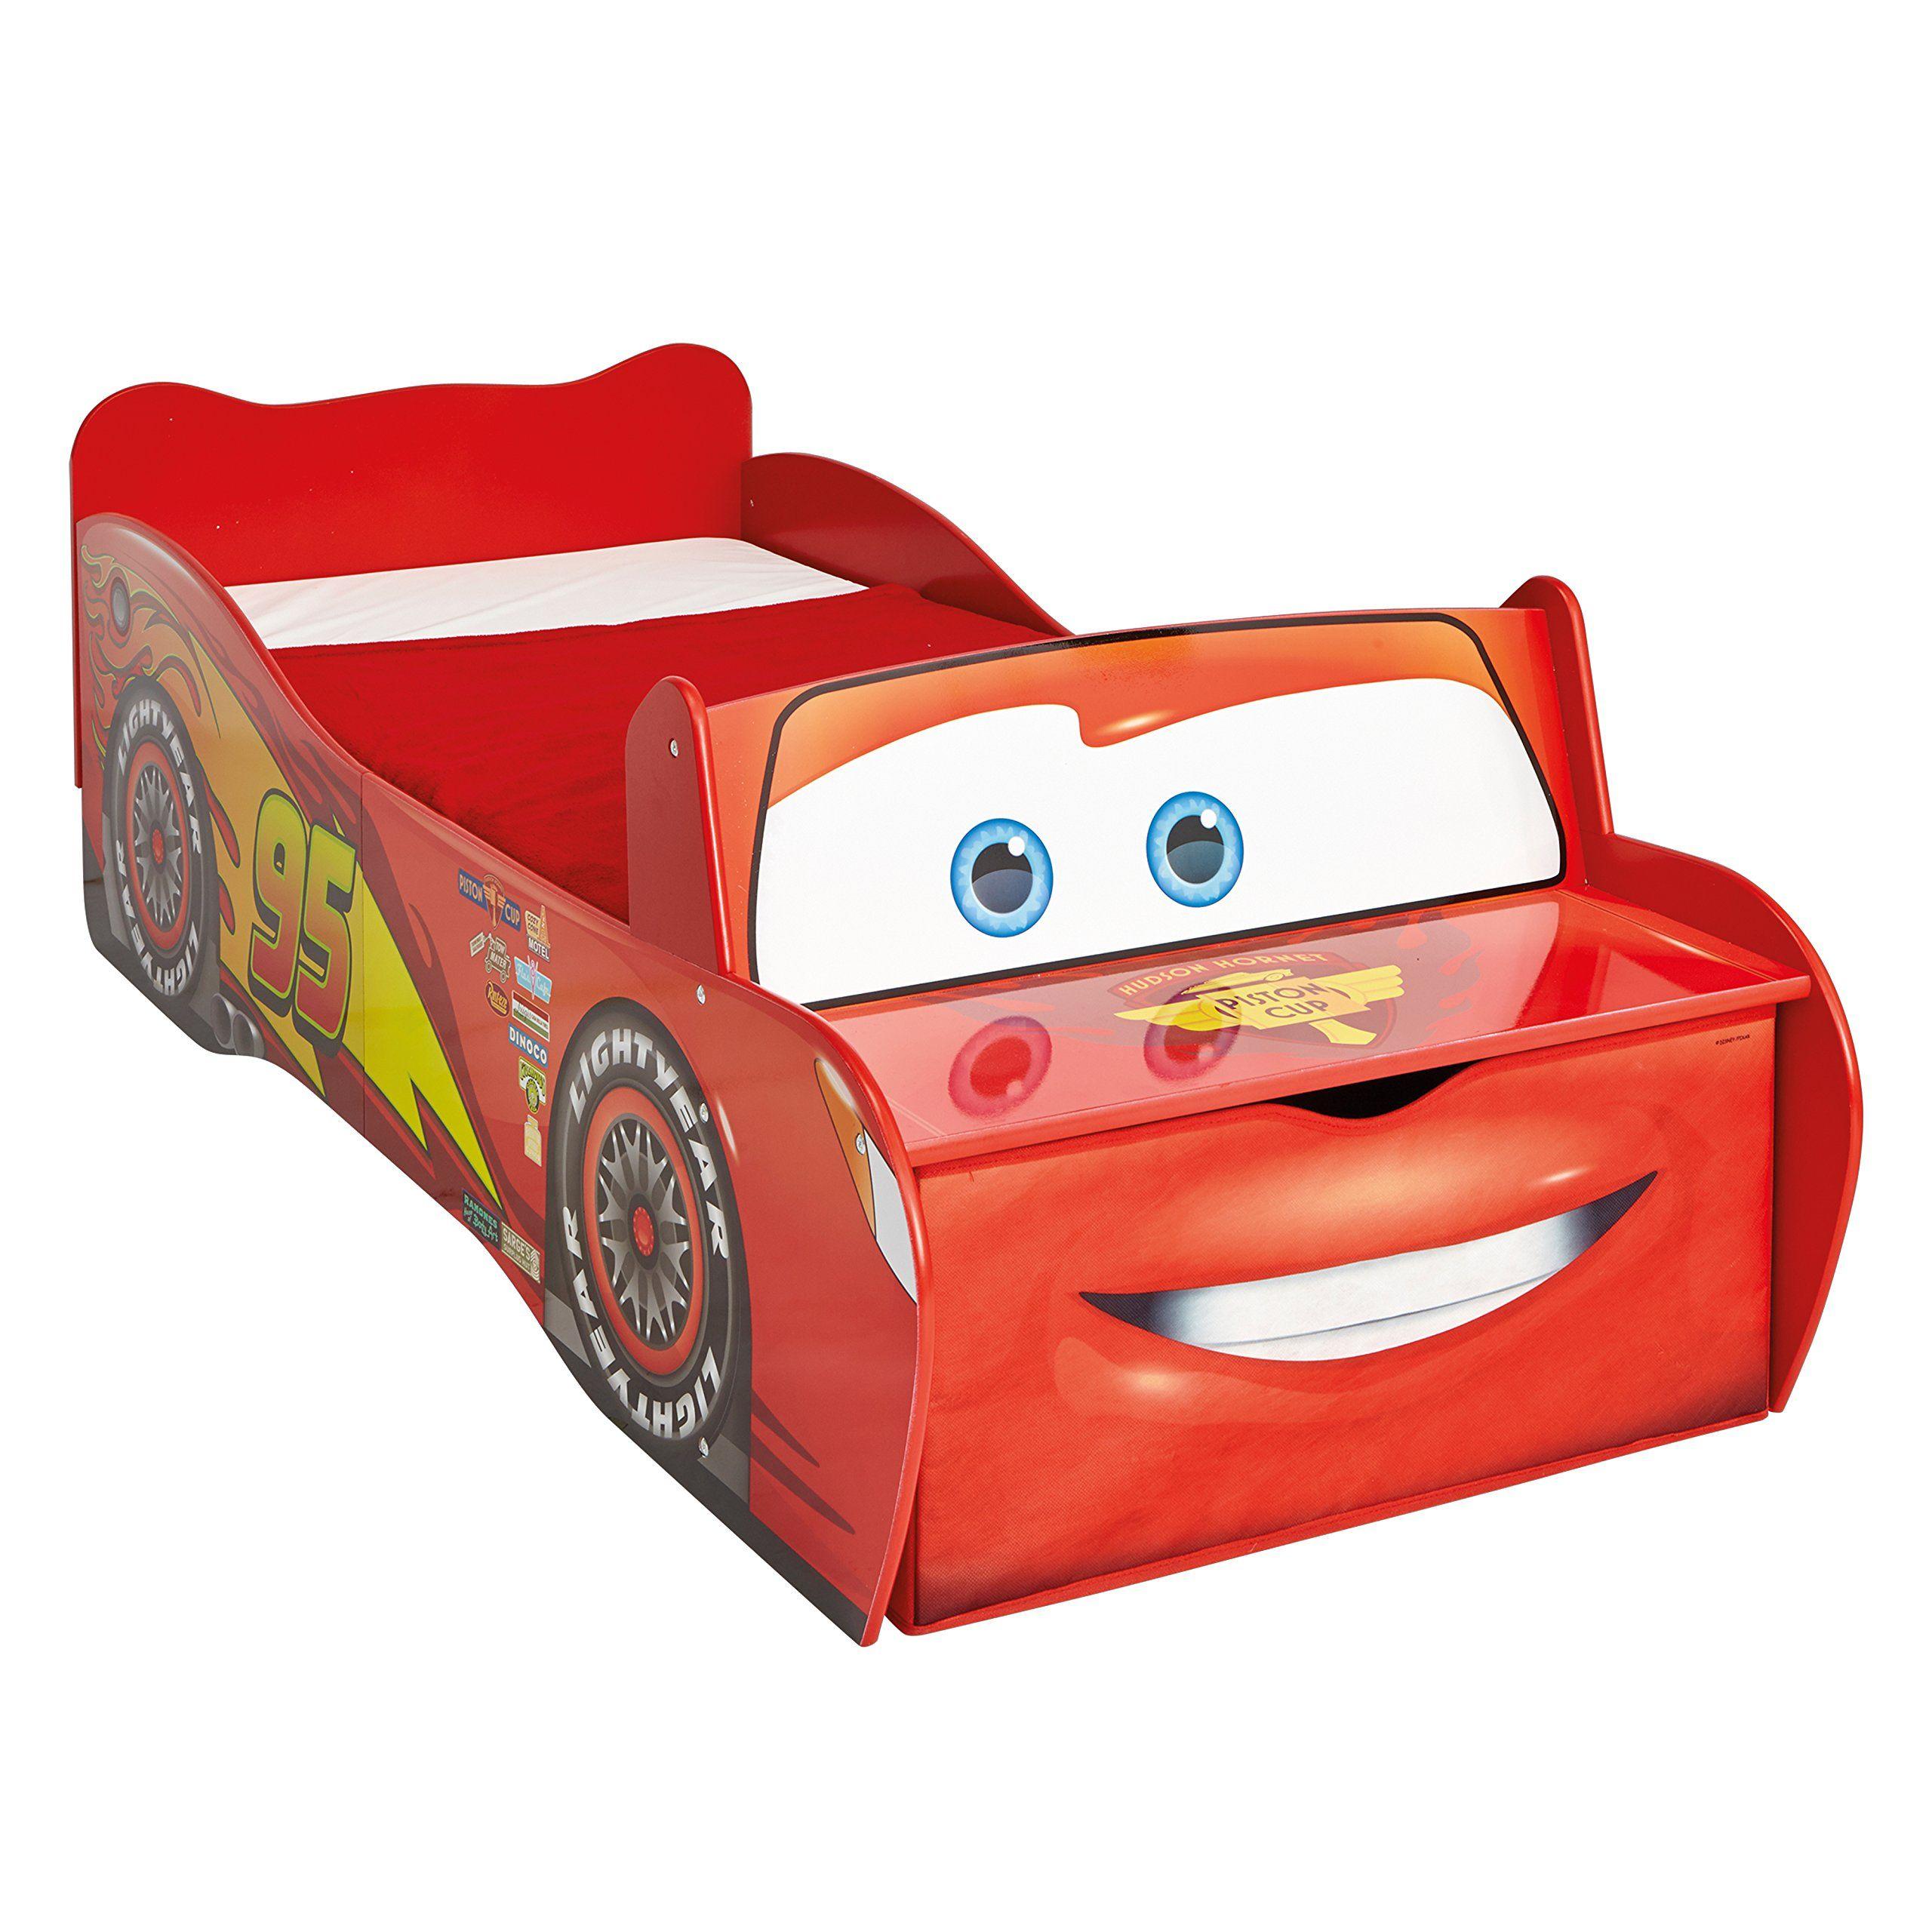 Shop Lightning mcqueen toddler bed, Disney cars toddler